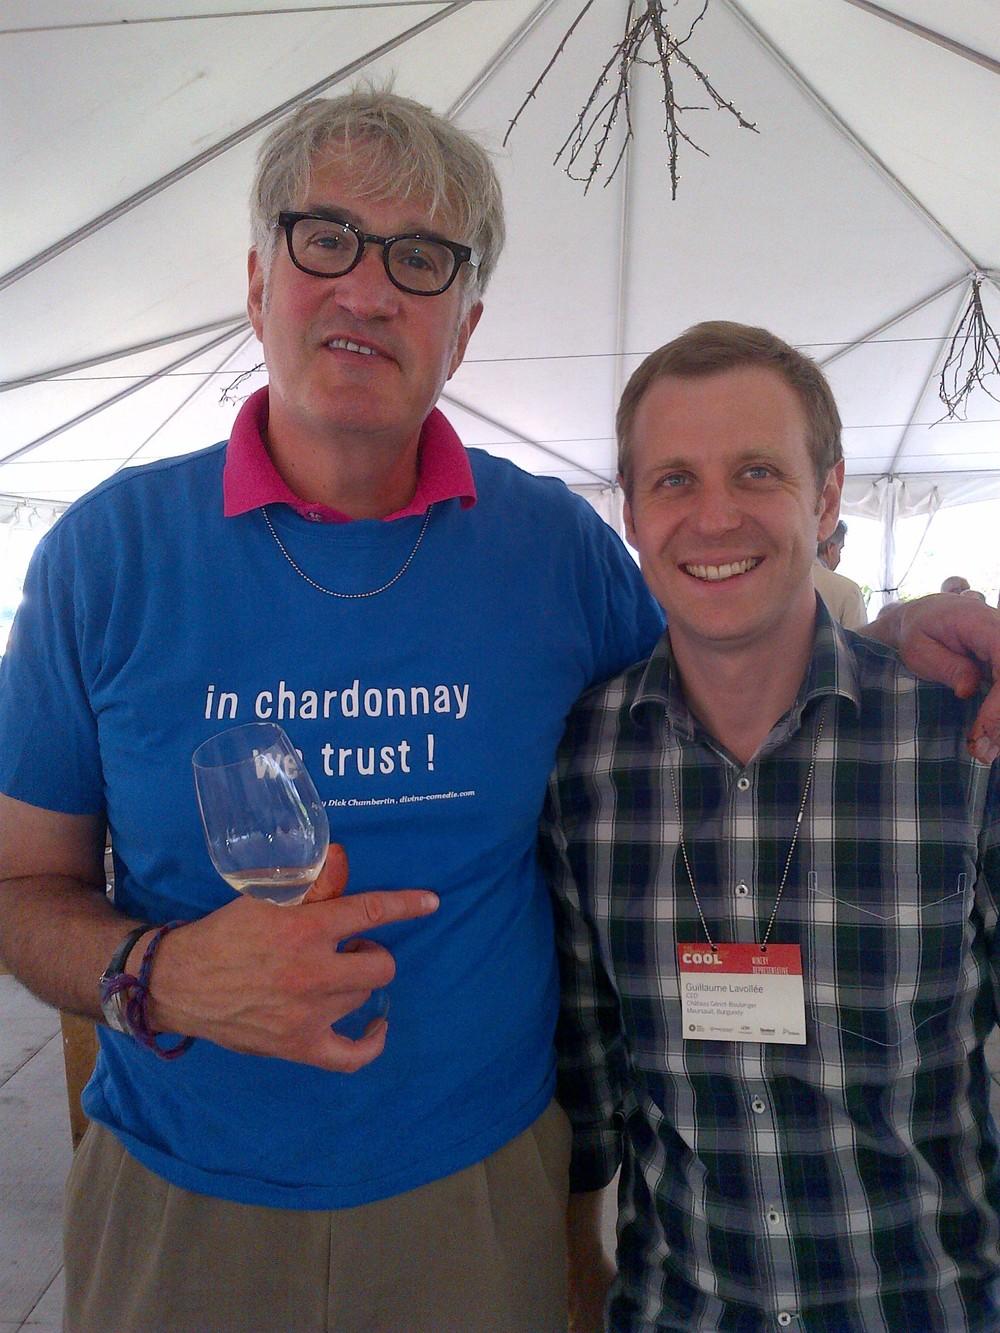 Thomas Bachelder et al Trust in Chardonnay.